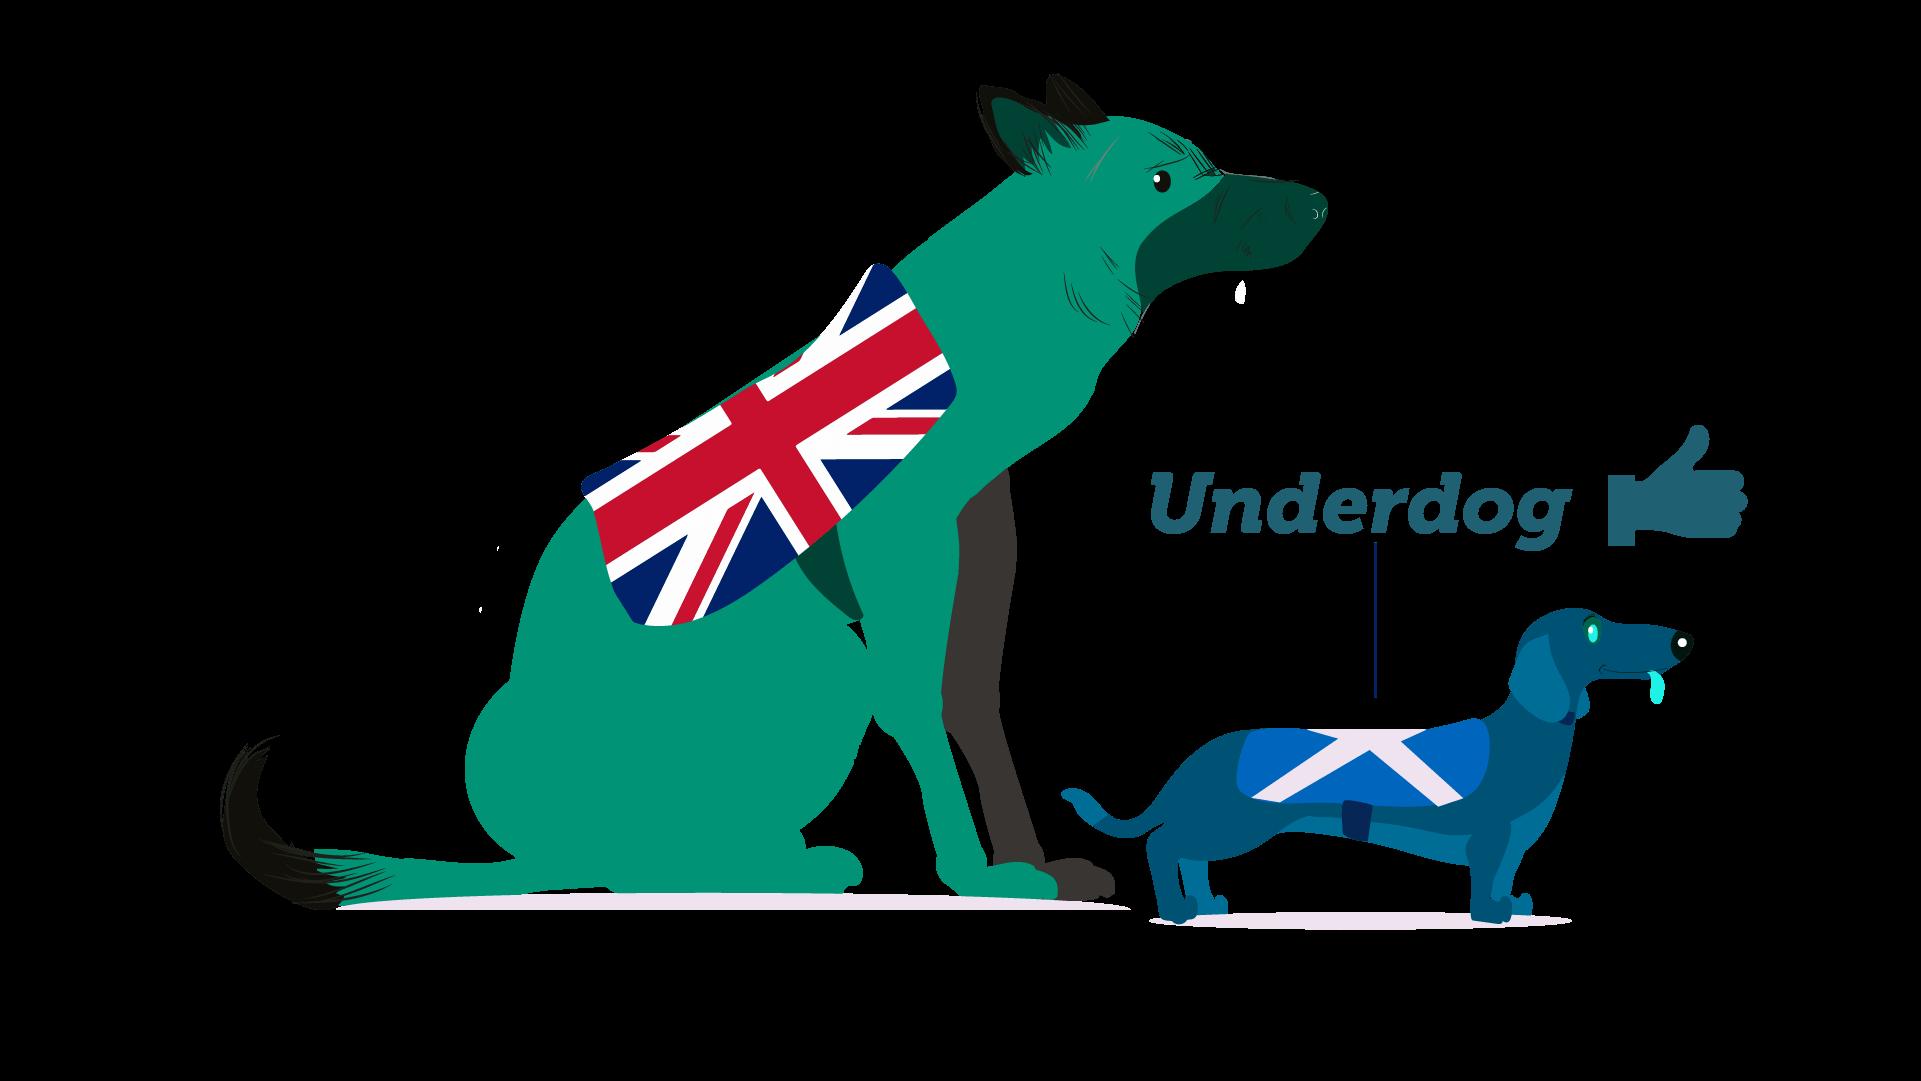 underdog effect marketing psychology indyref2 large dog with british falg on back standing over small dog wearing scottish flag